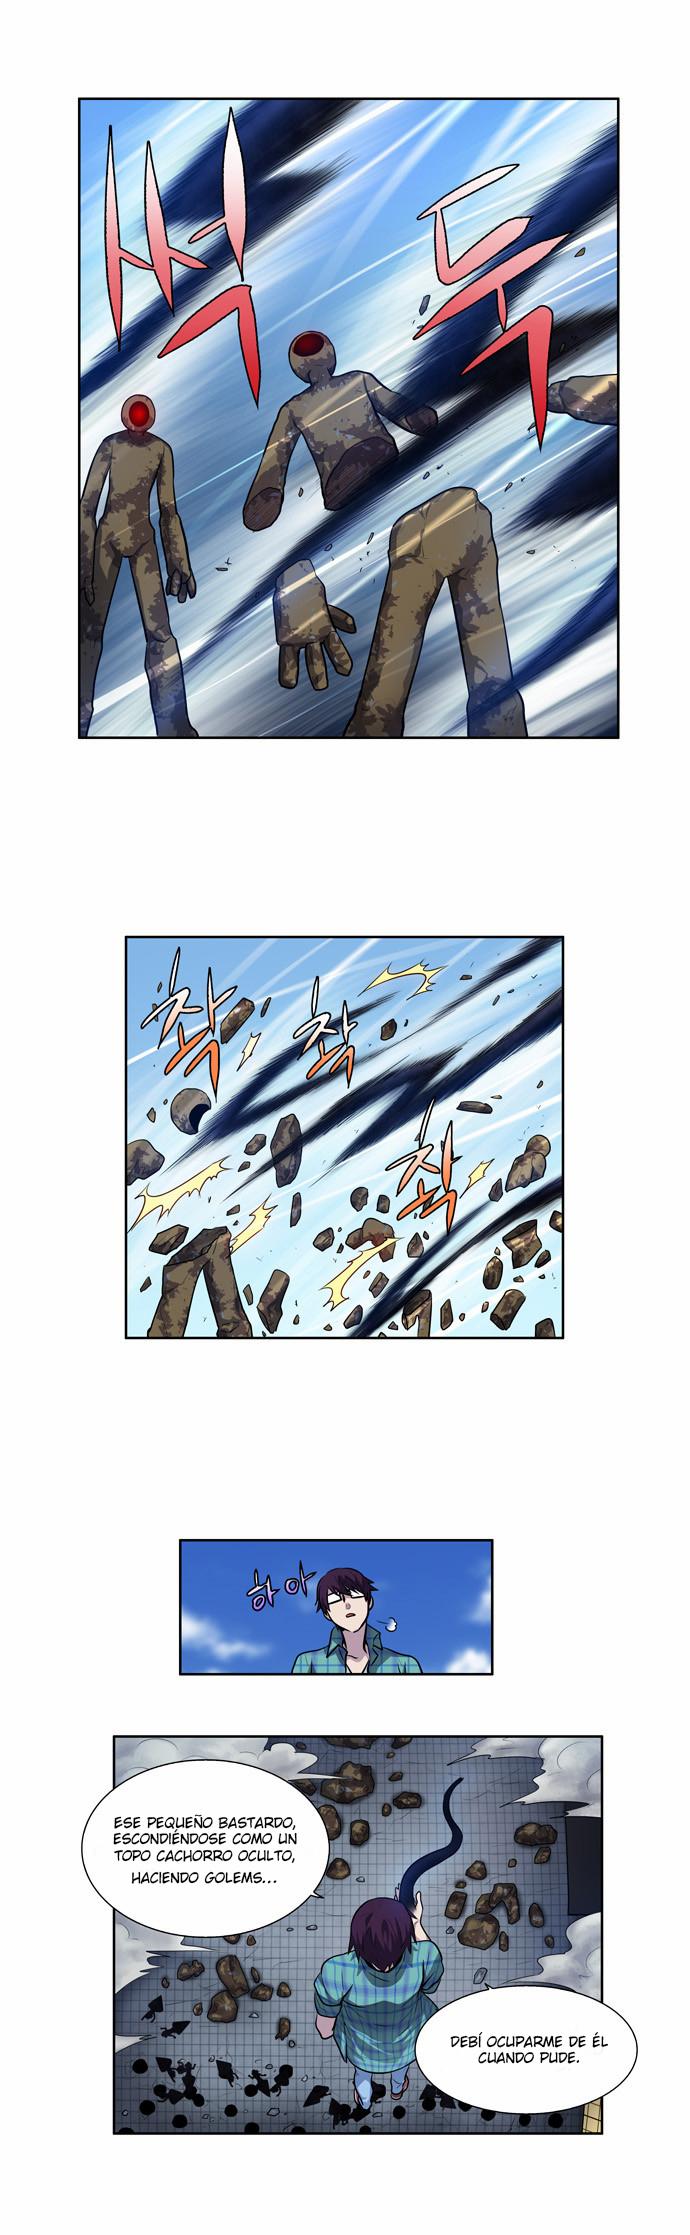 https://c5.ninemanga.com/es_manga/61/1725/439980/0f69f766b0e791190d856ab6538d34b8.jpg Page 5